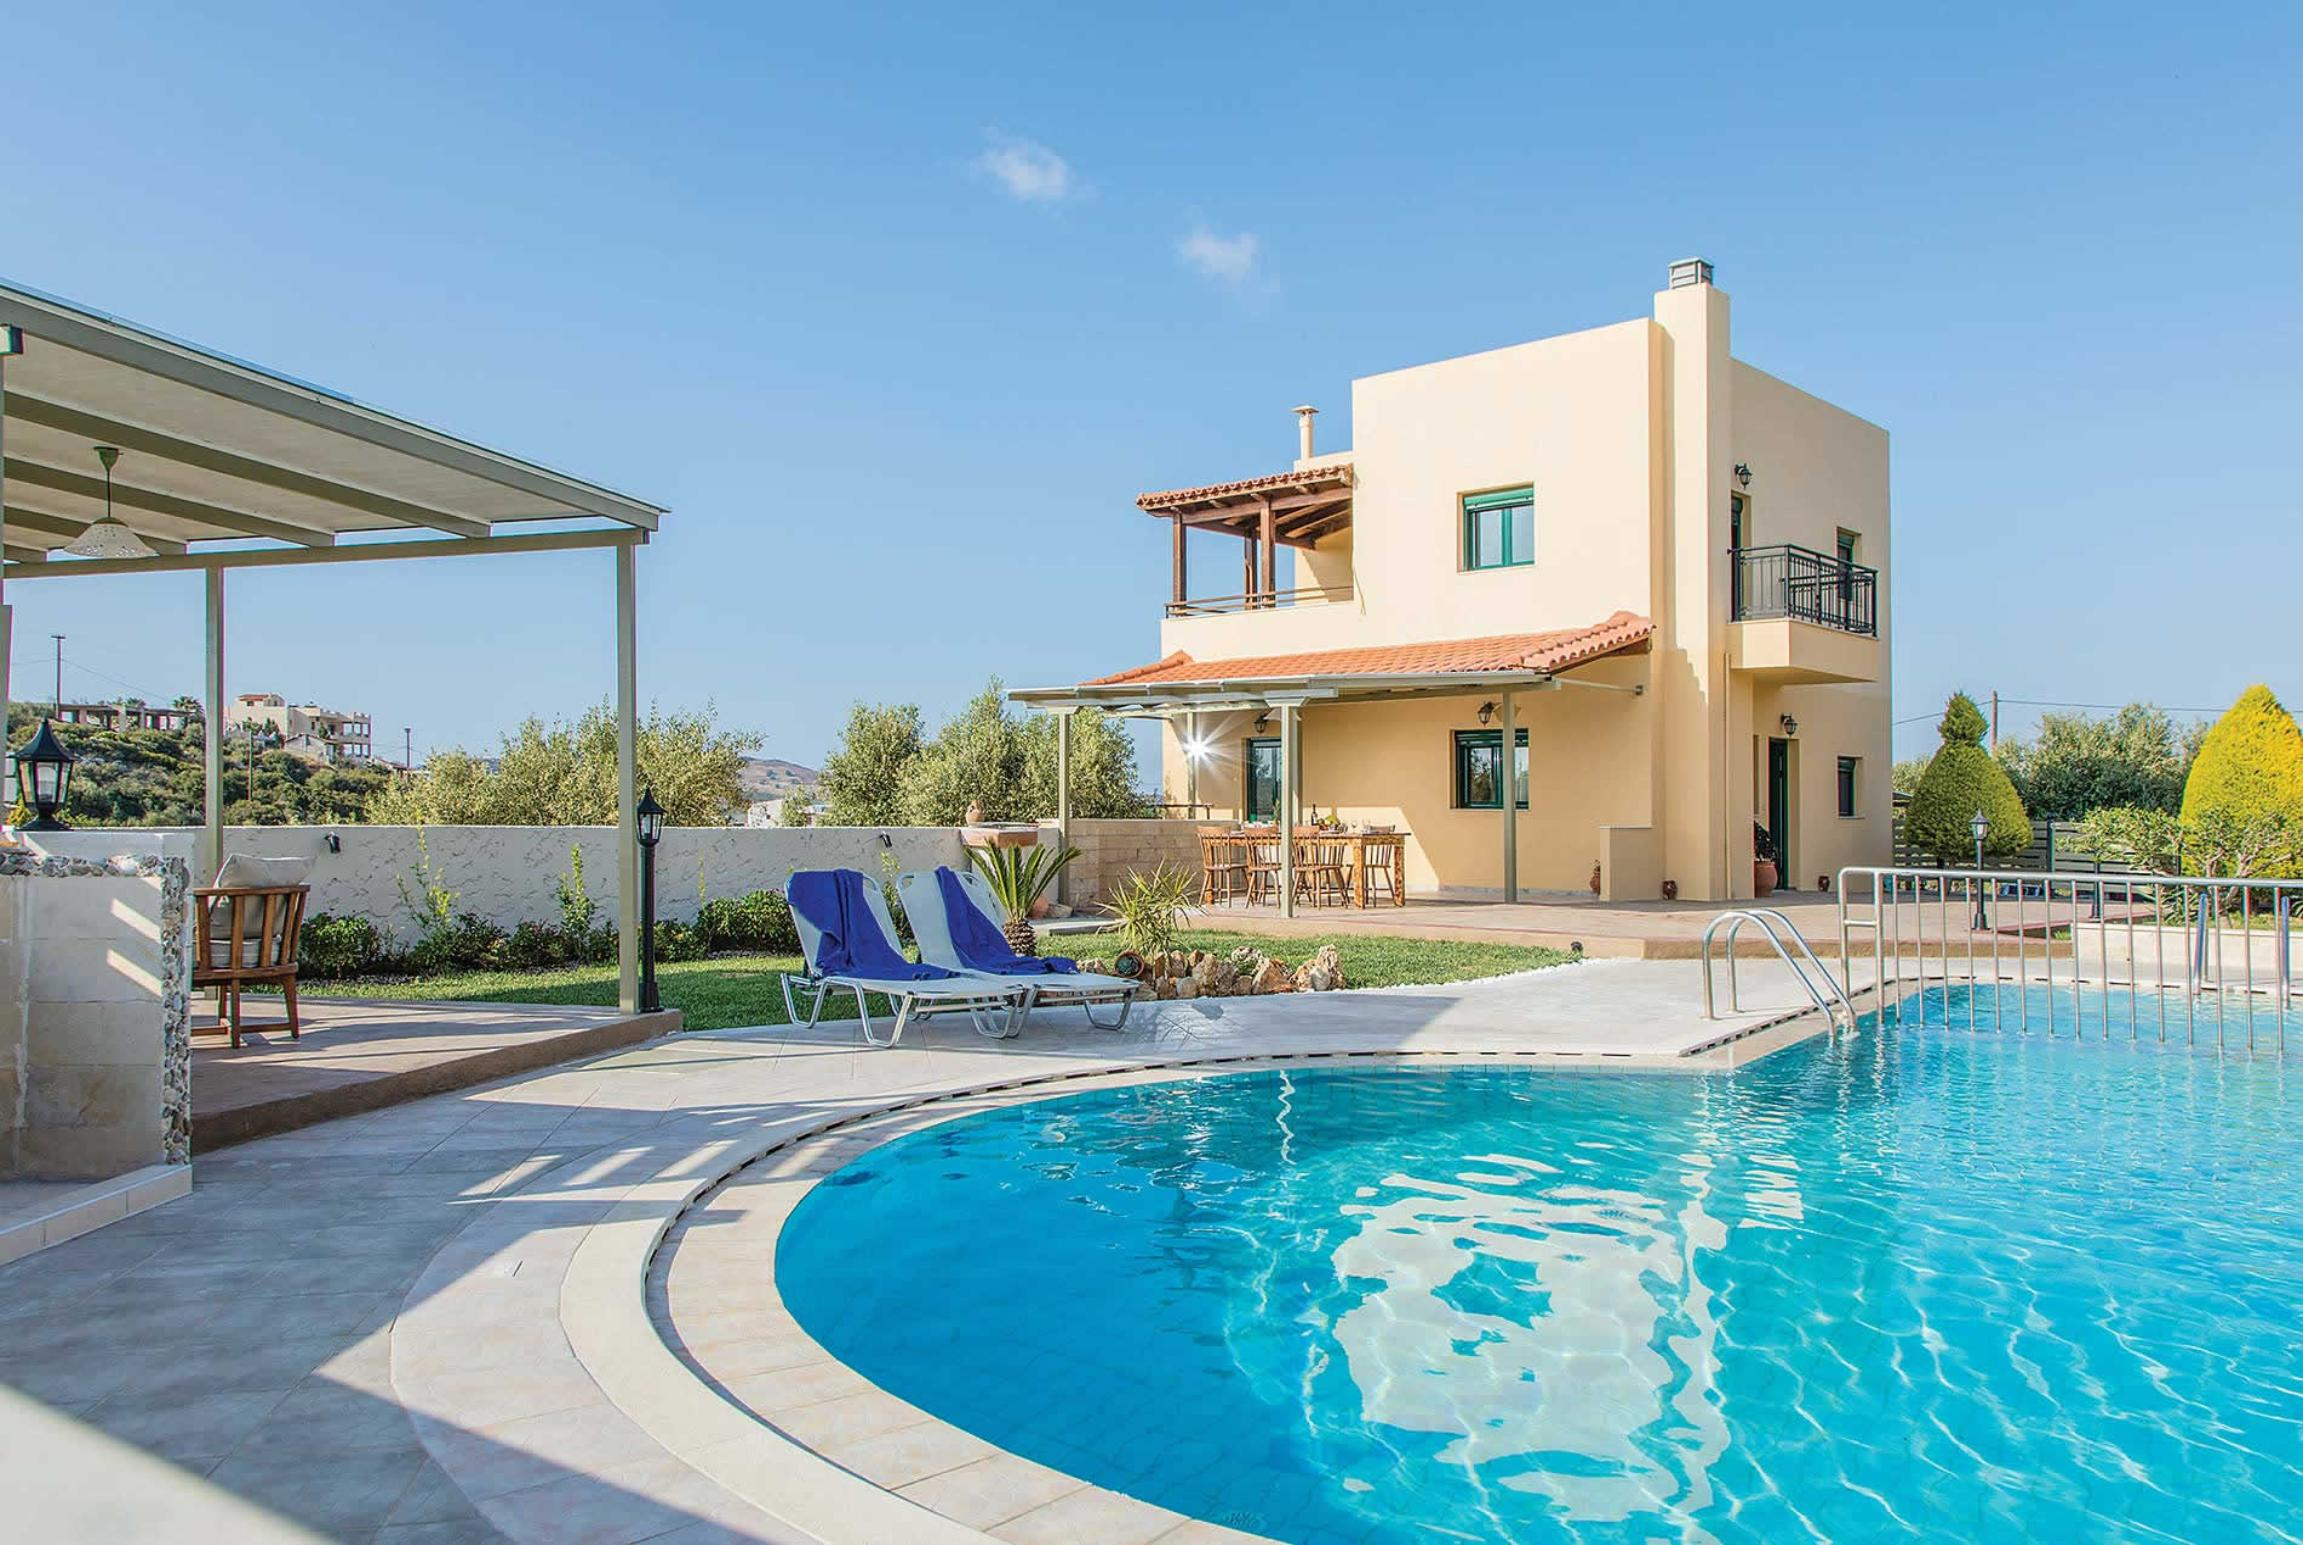 Ferienhaus Dina (2653758), Roumeli, Kreta Nordküste, Kreta, Griechenland, Bild 17